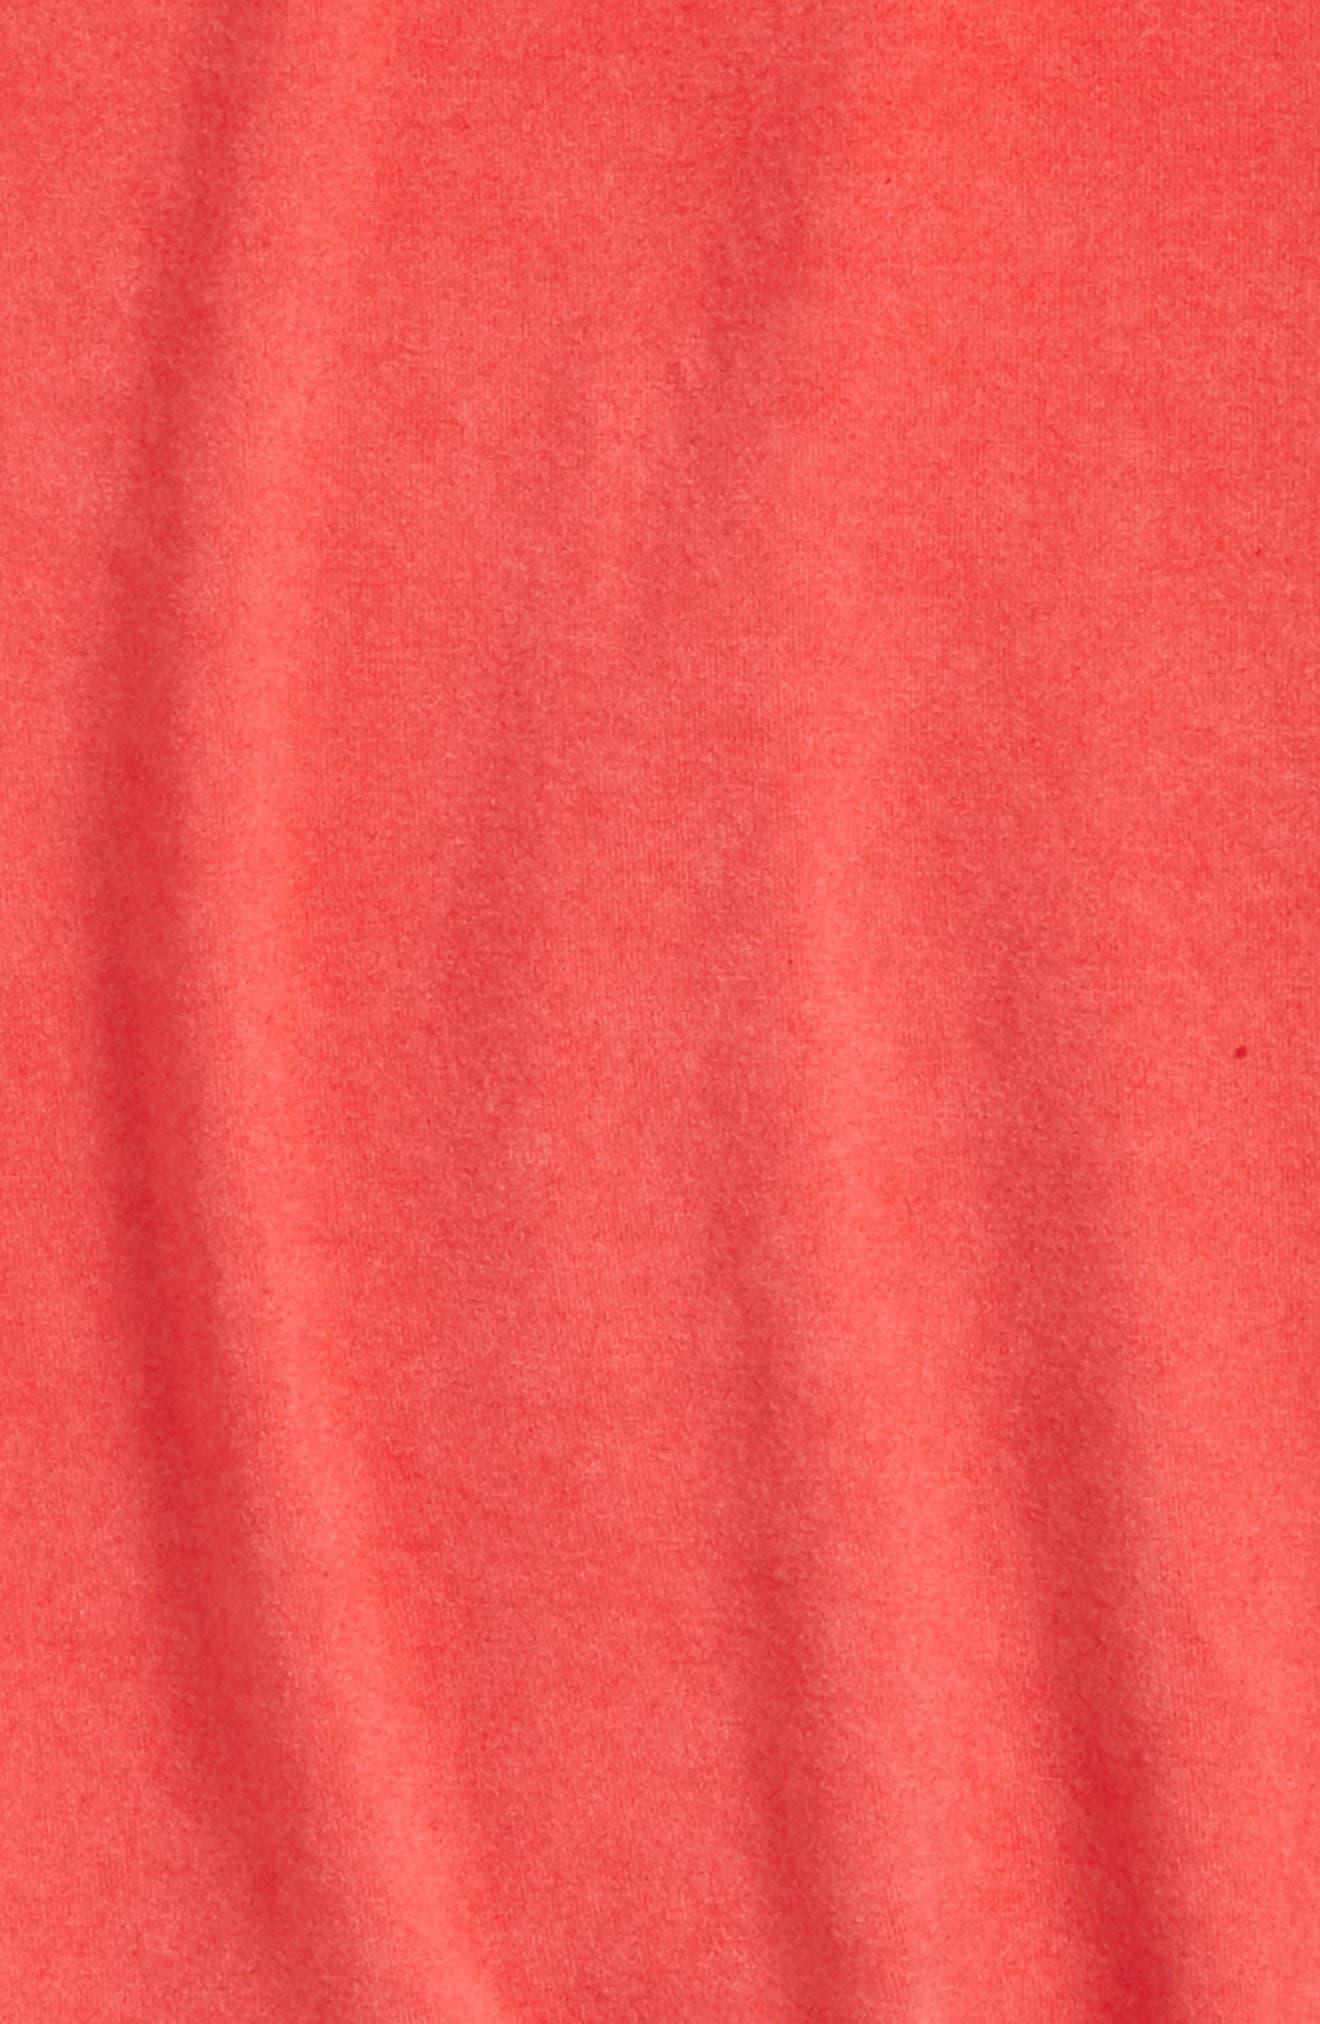 Peplum Tee,                             Alternate thumbnail 2, color,                             Coral Hot Wash